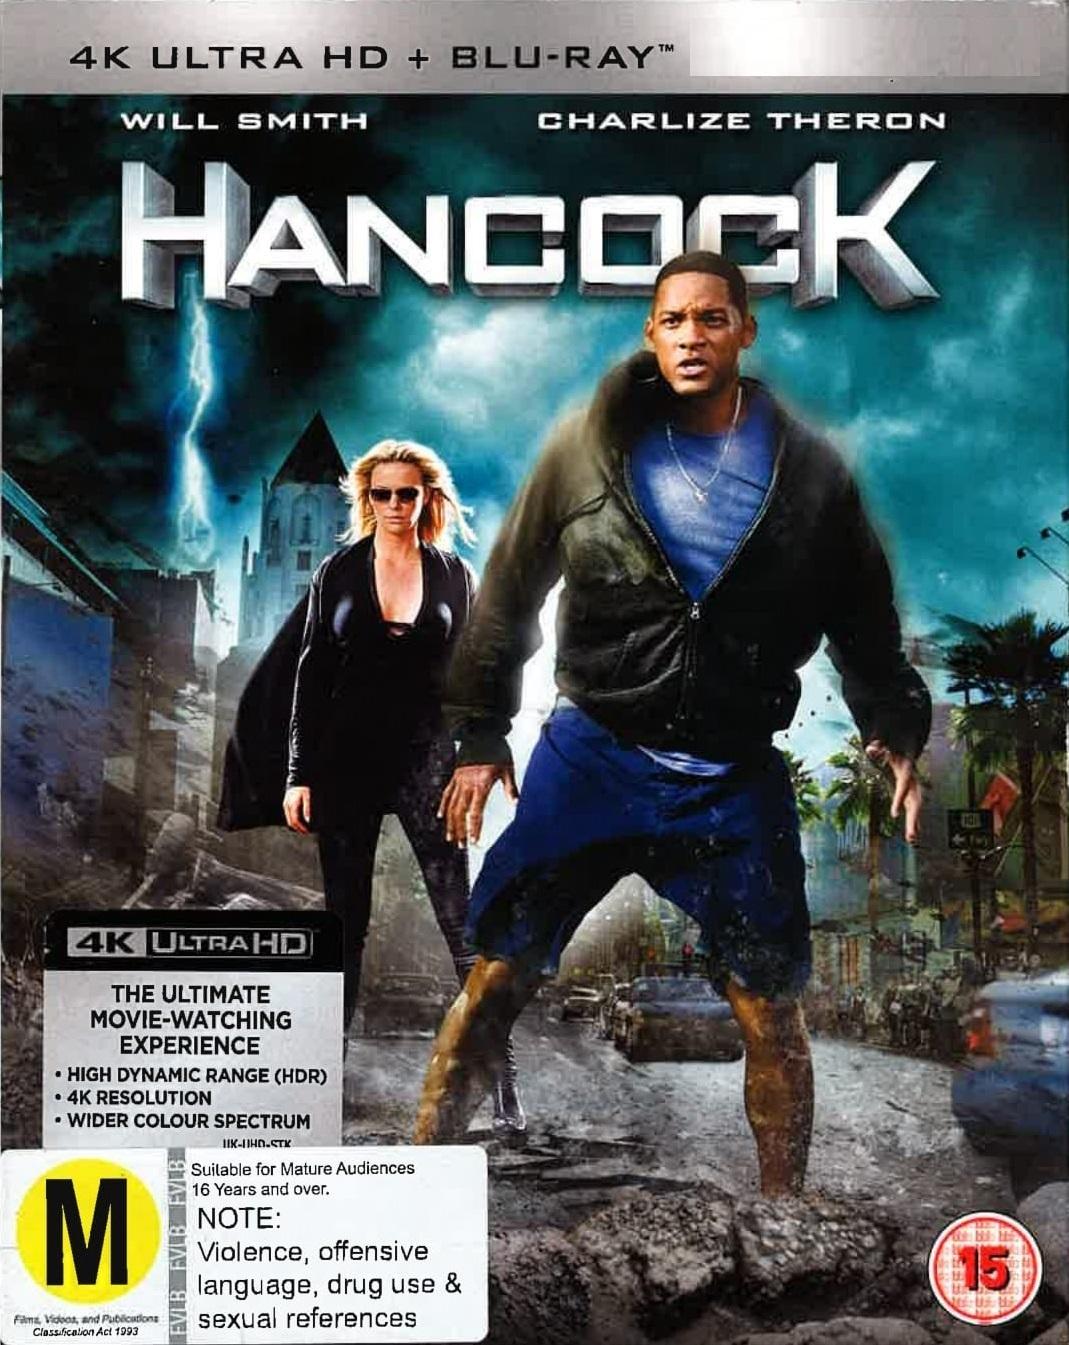 Hancock on Blu-ray, UHD Blu-ray image